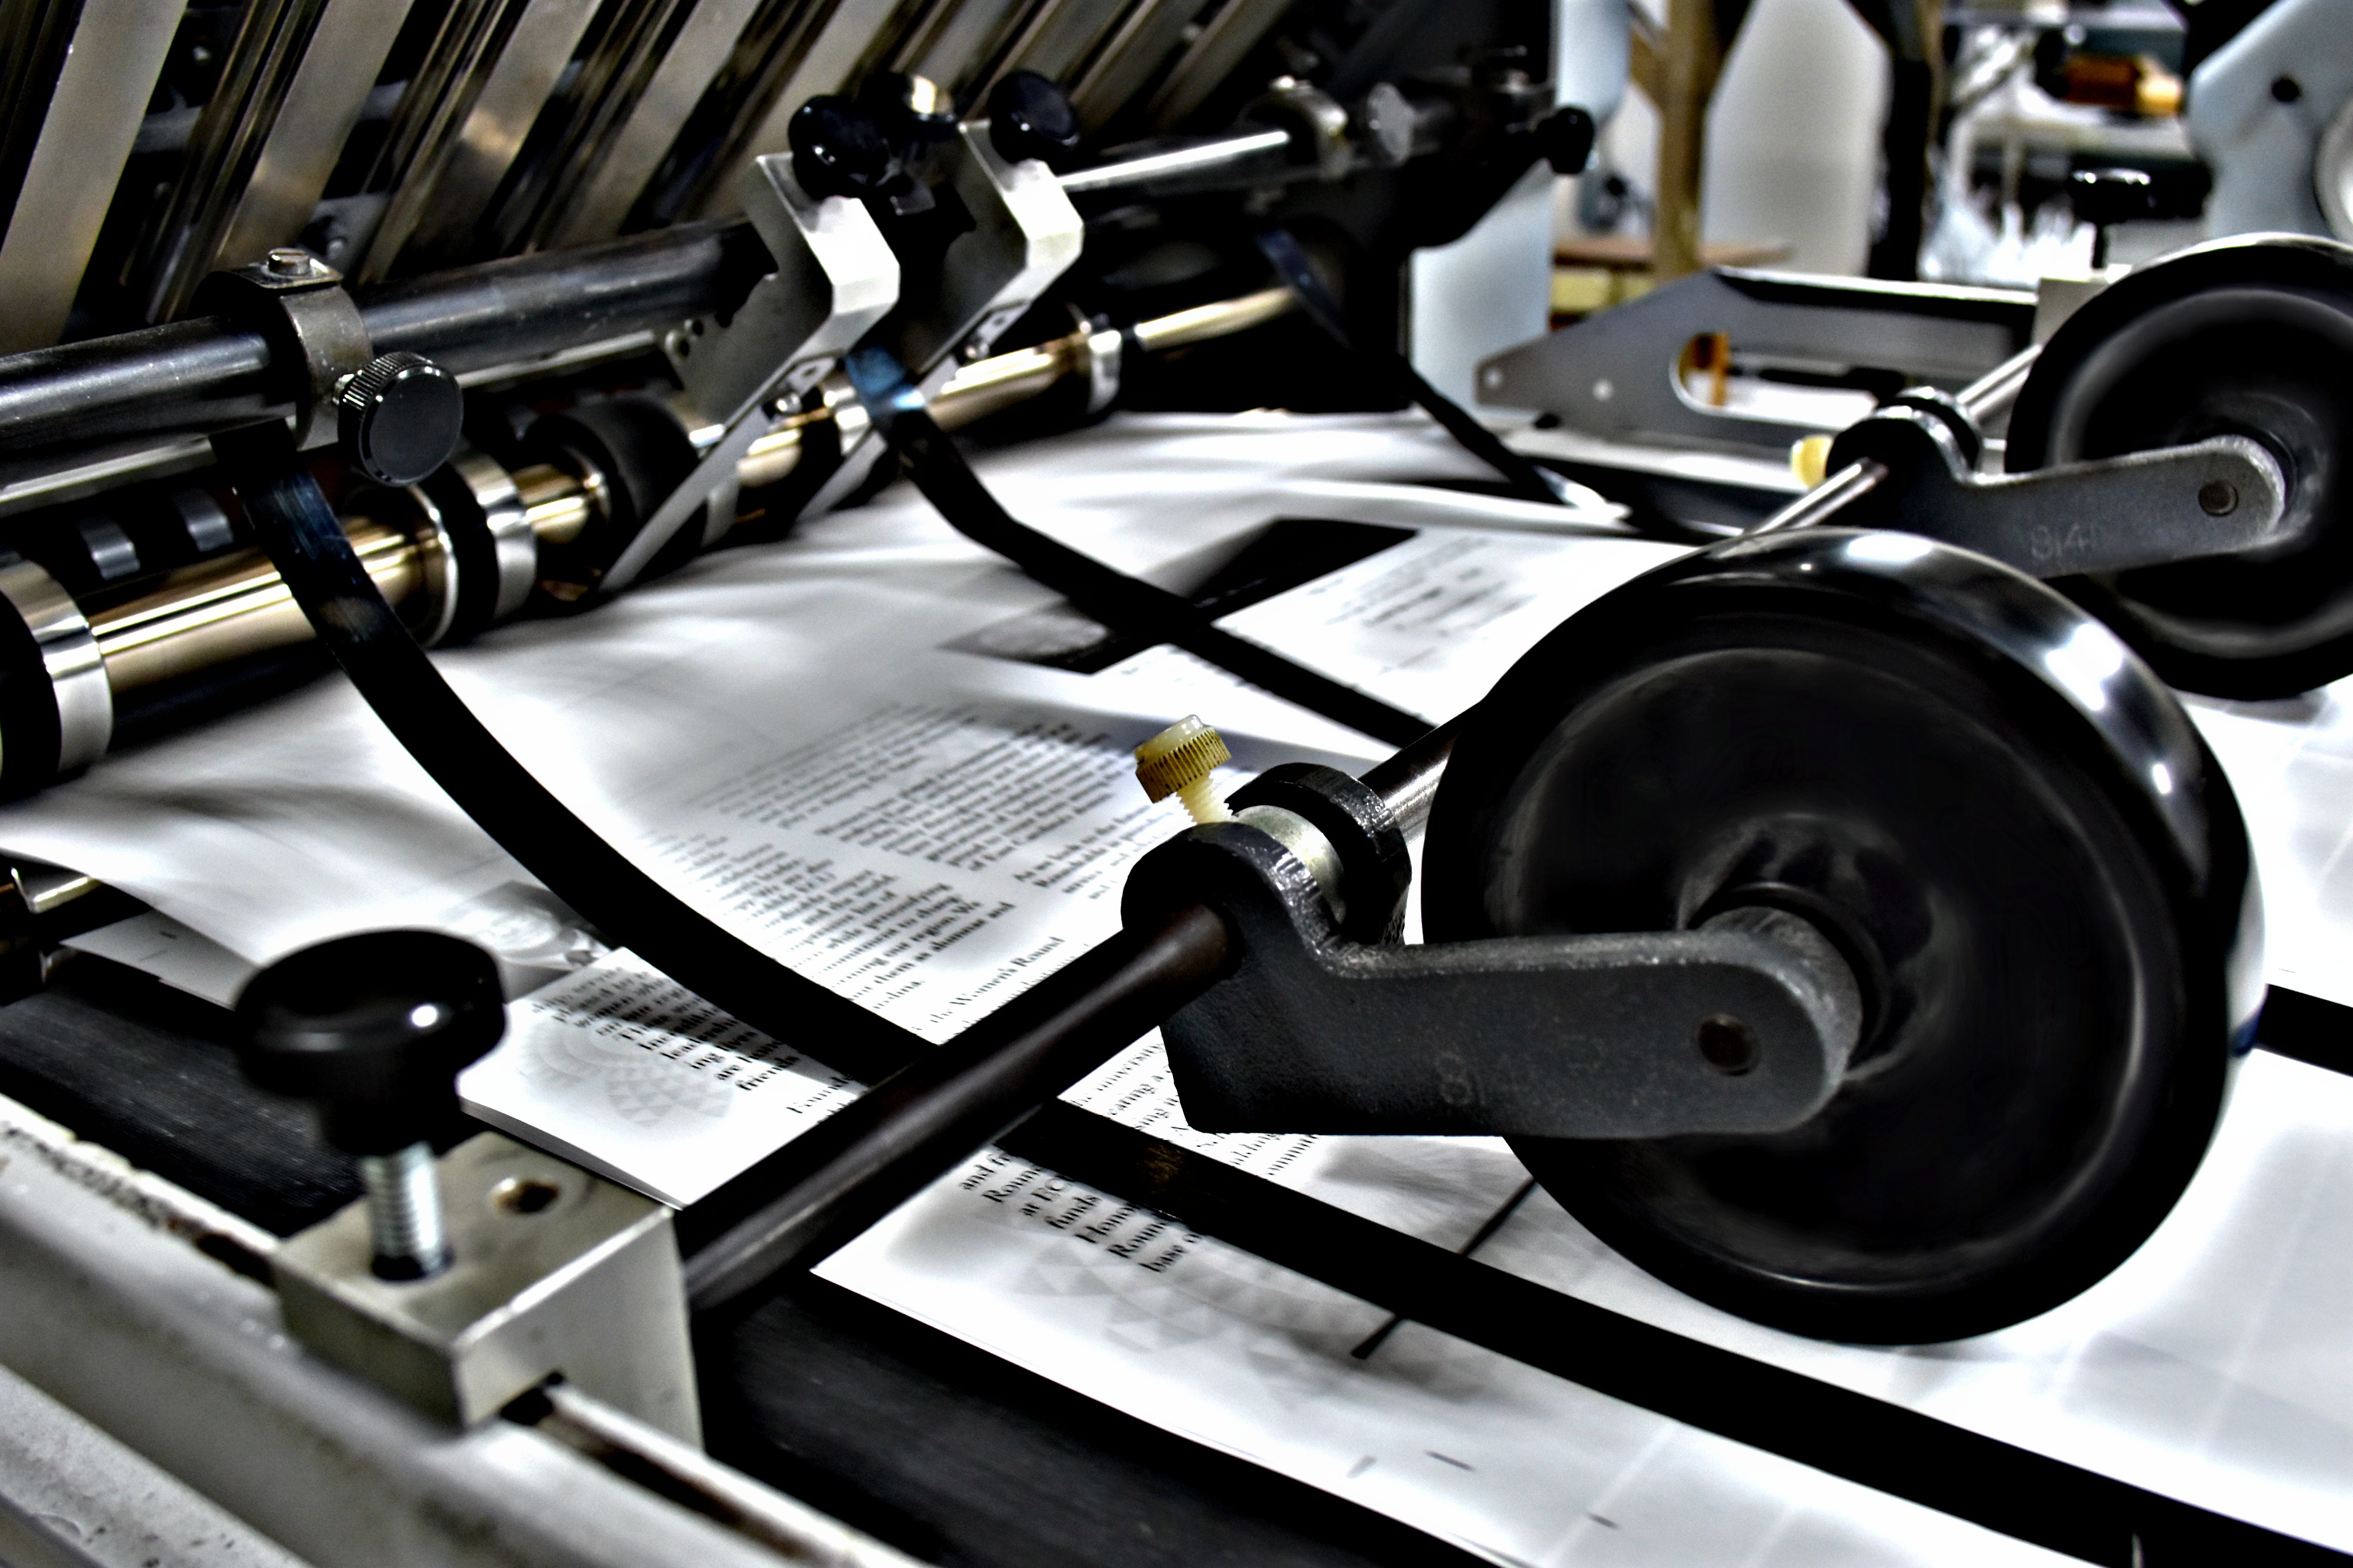 On-Demand Printing